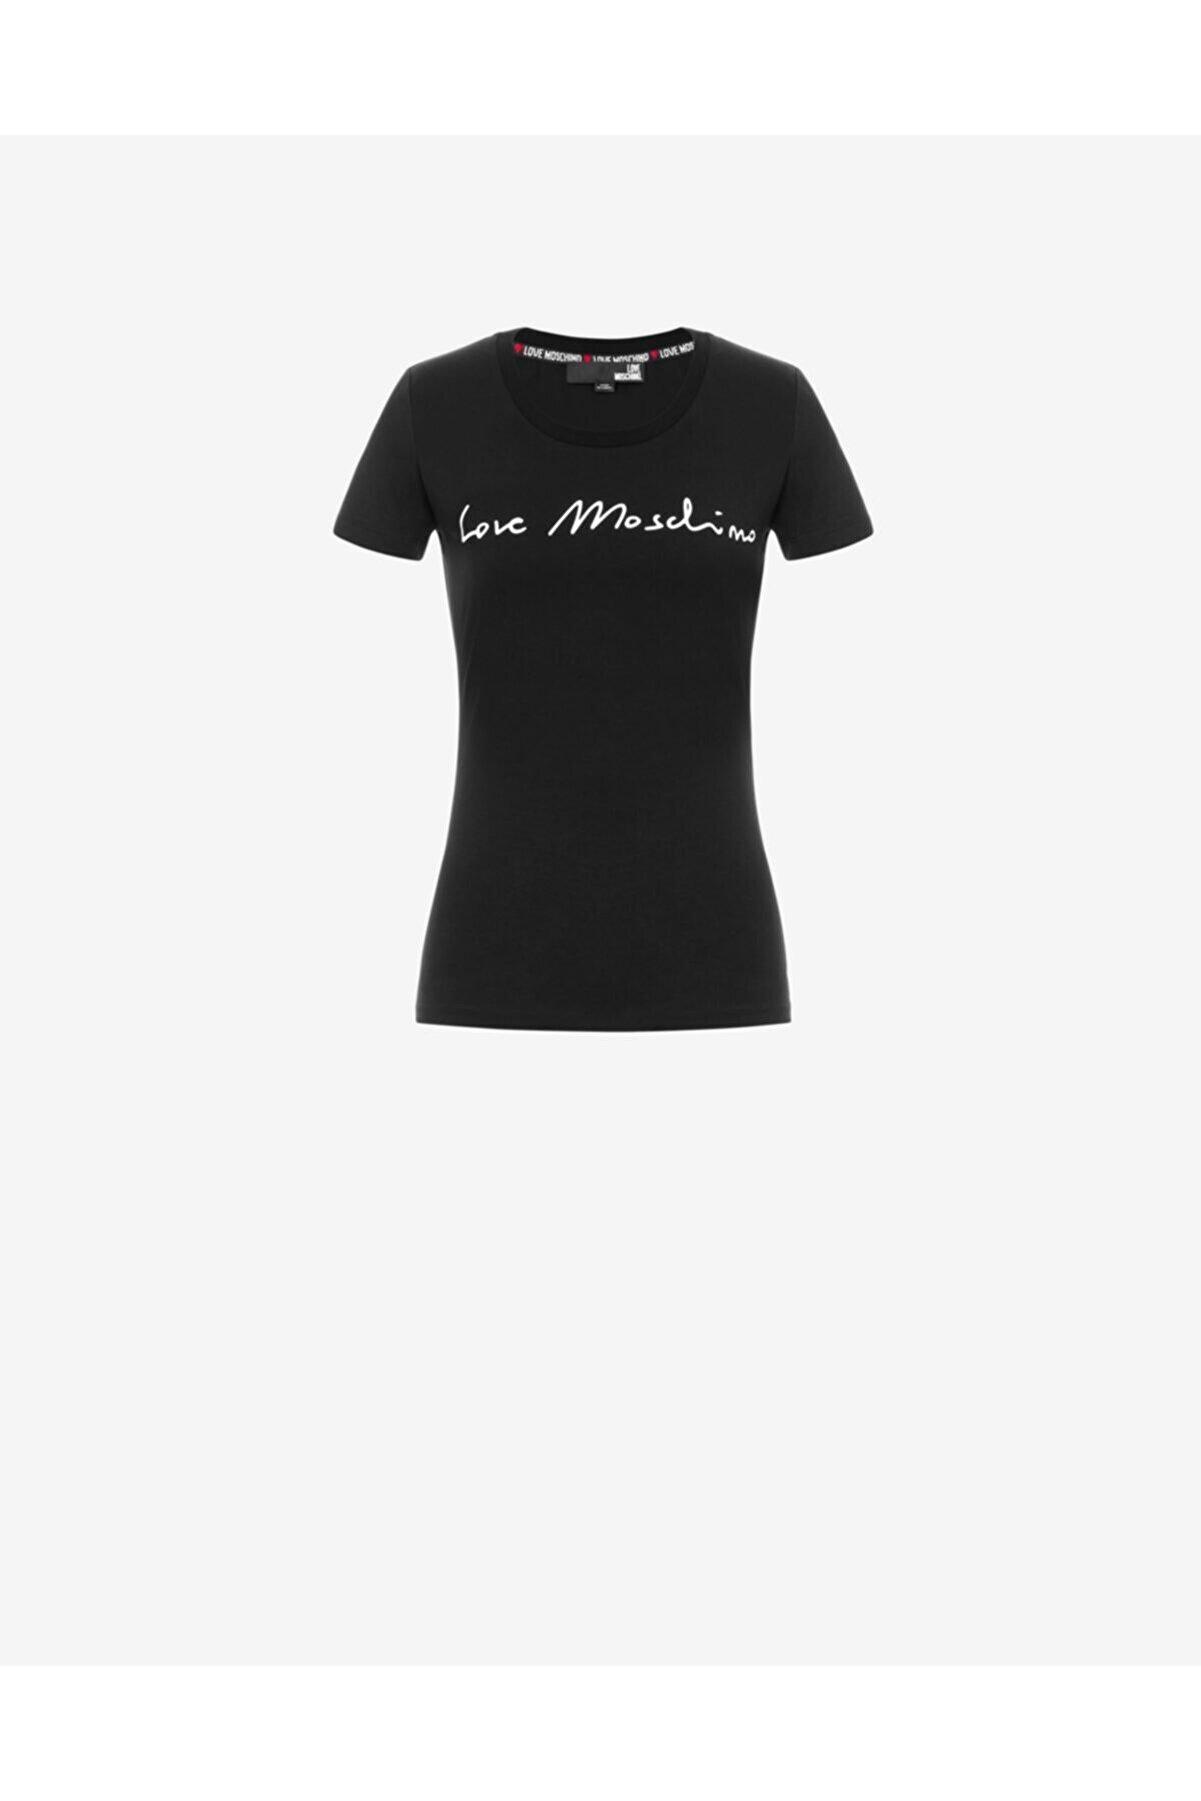 Moschino Kadın Siyah T-Shirt  t-w 4 H19 01